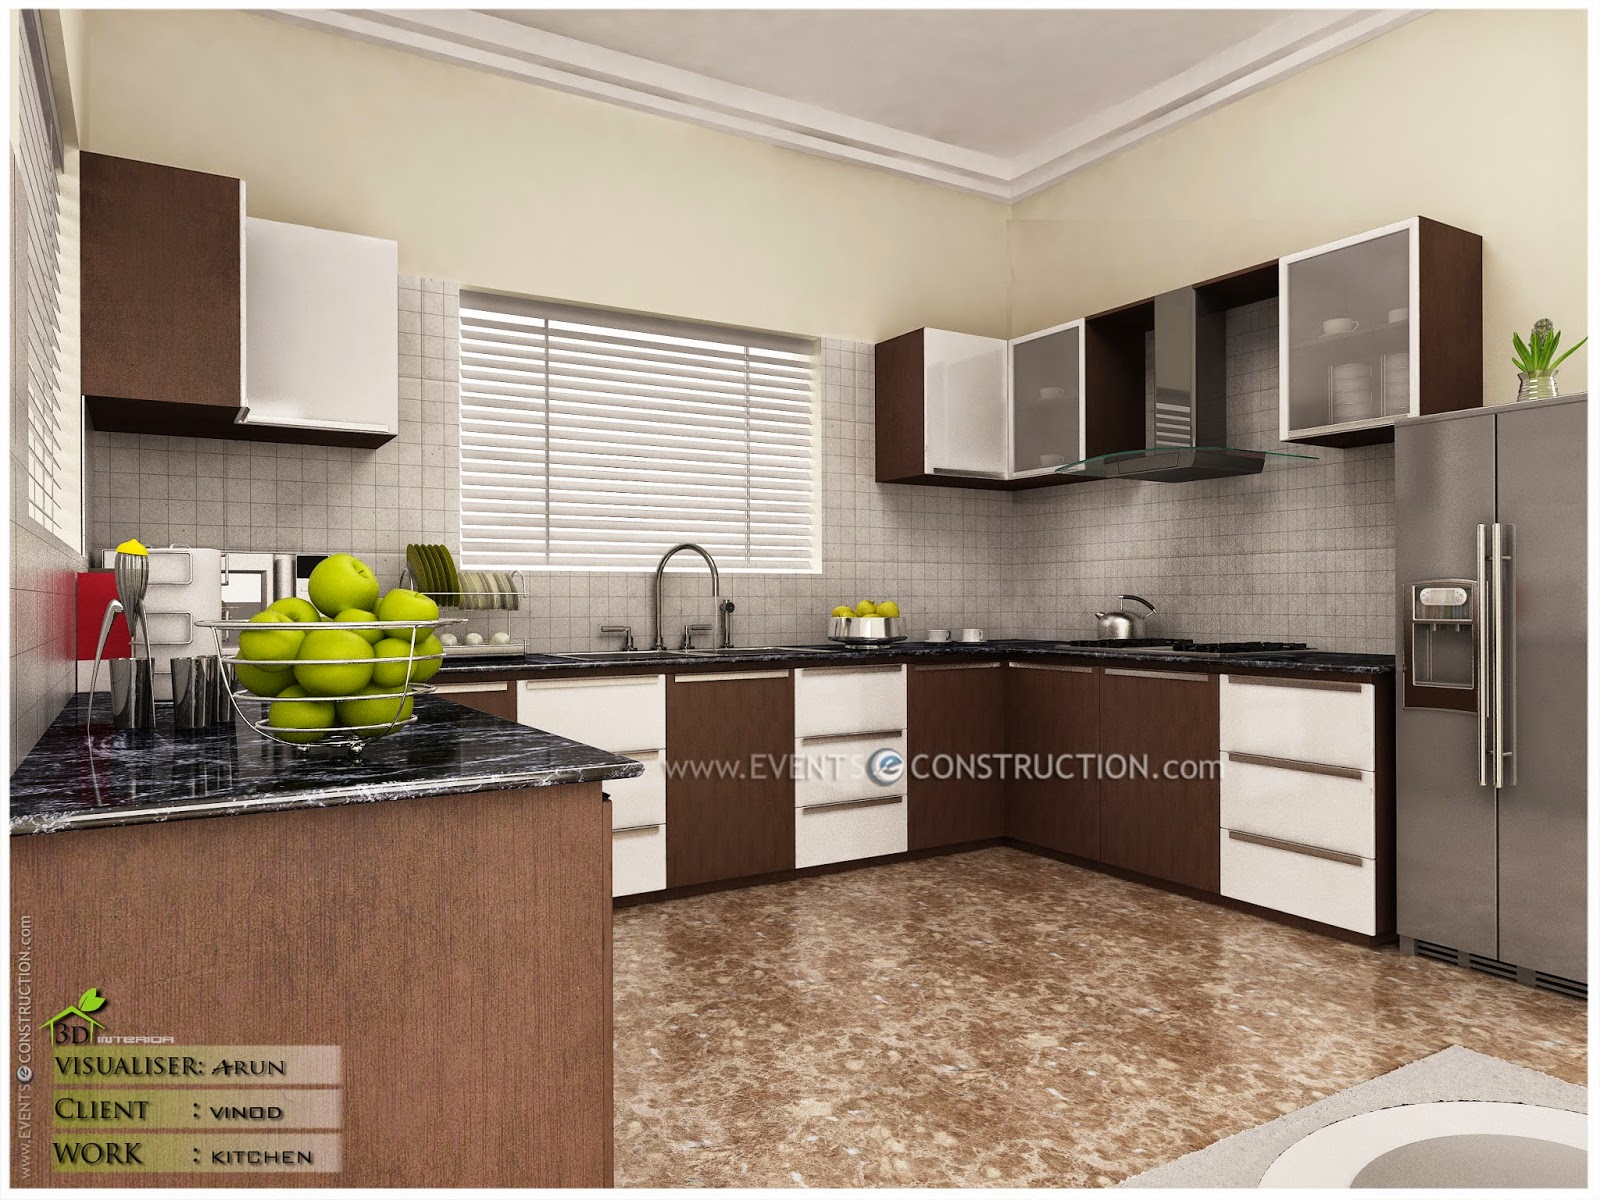 Evens Construction Pvt Ltd: Modern kerala kitchen interior